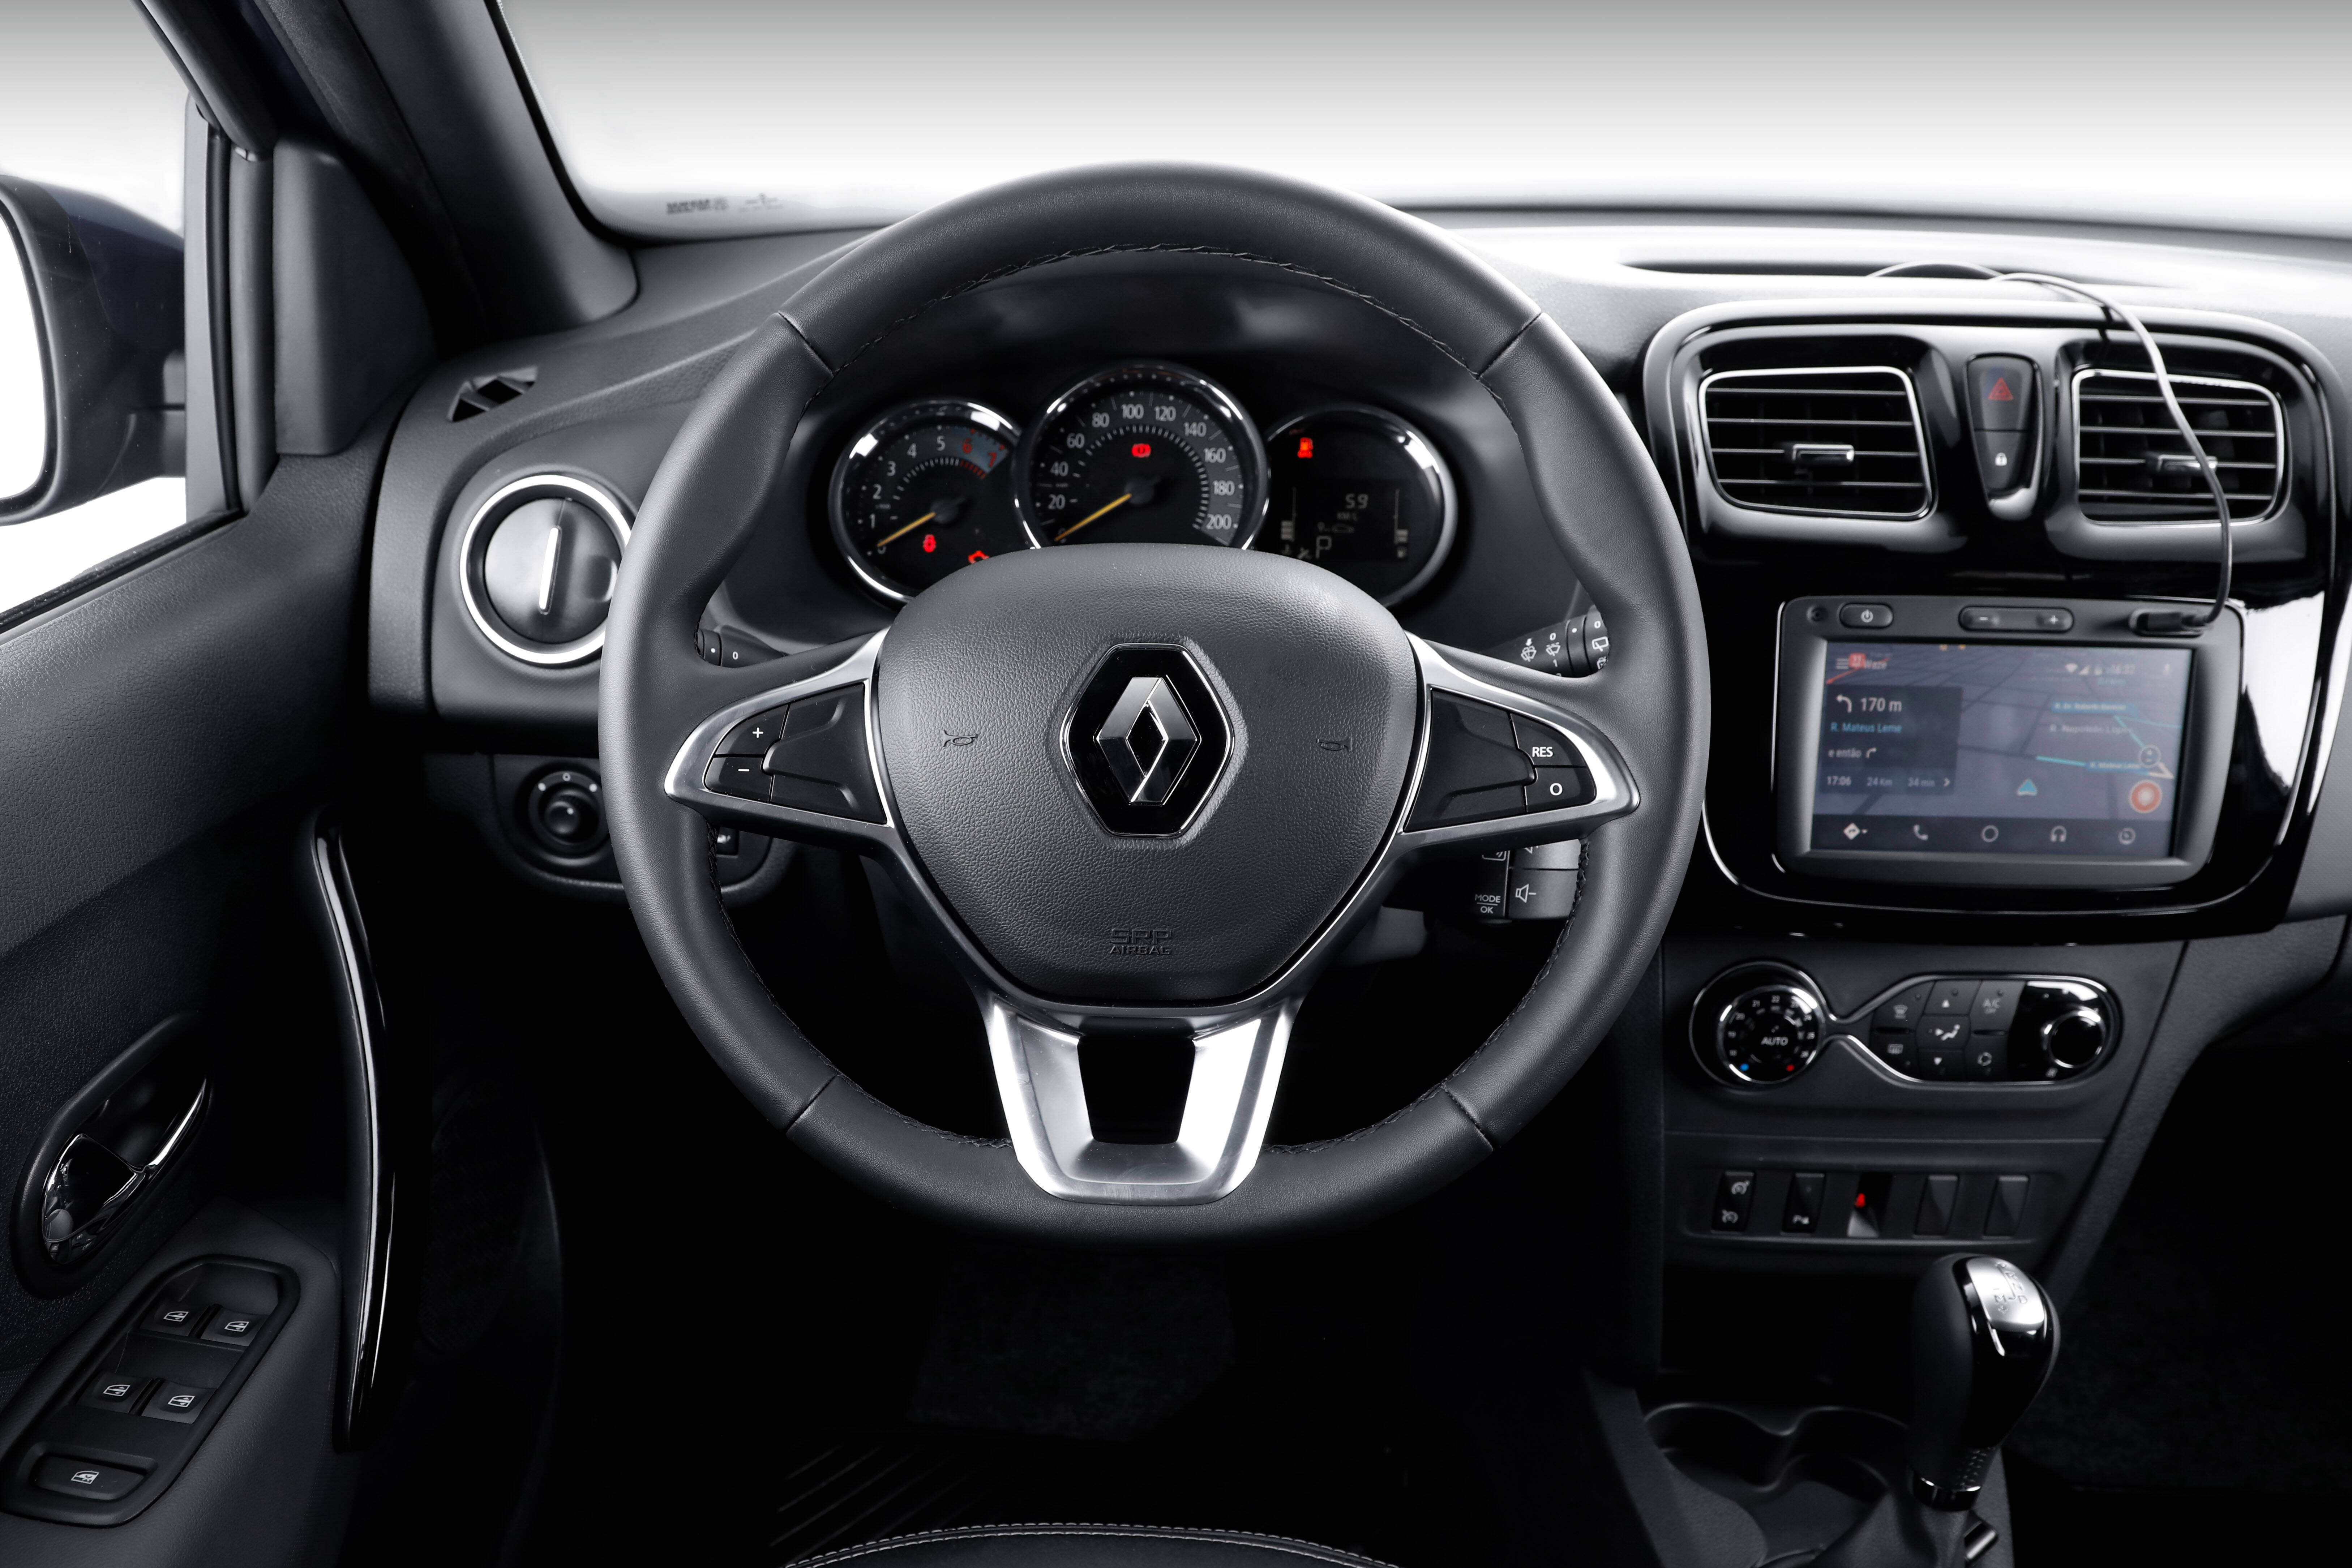 Renault Sandero. Foto: Divulgação